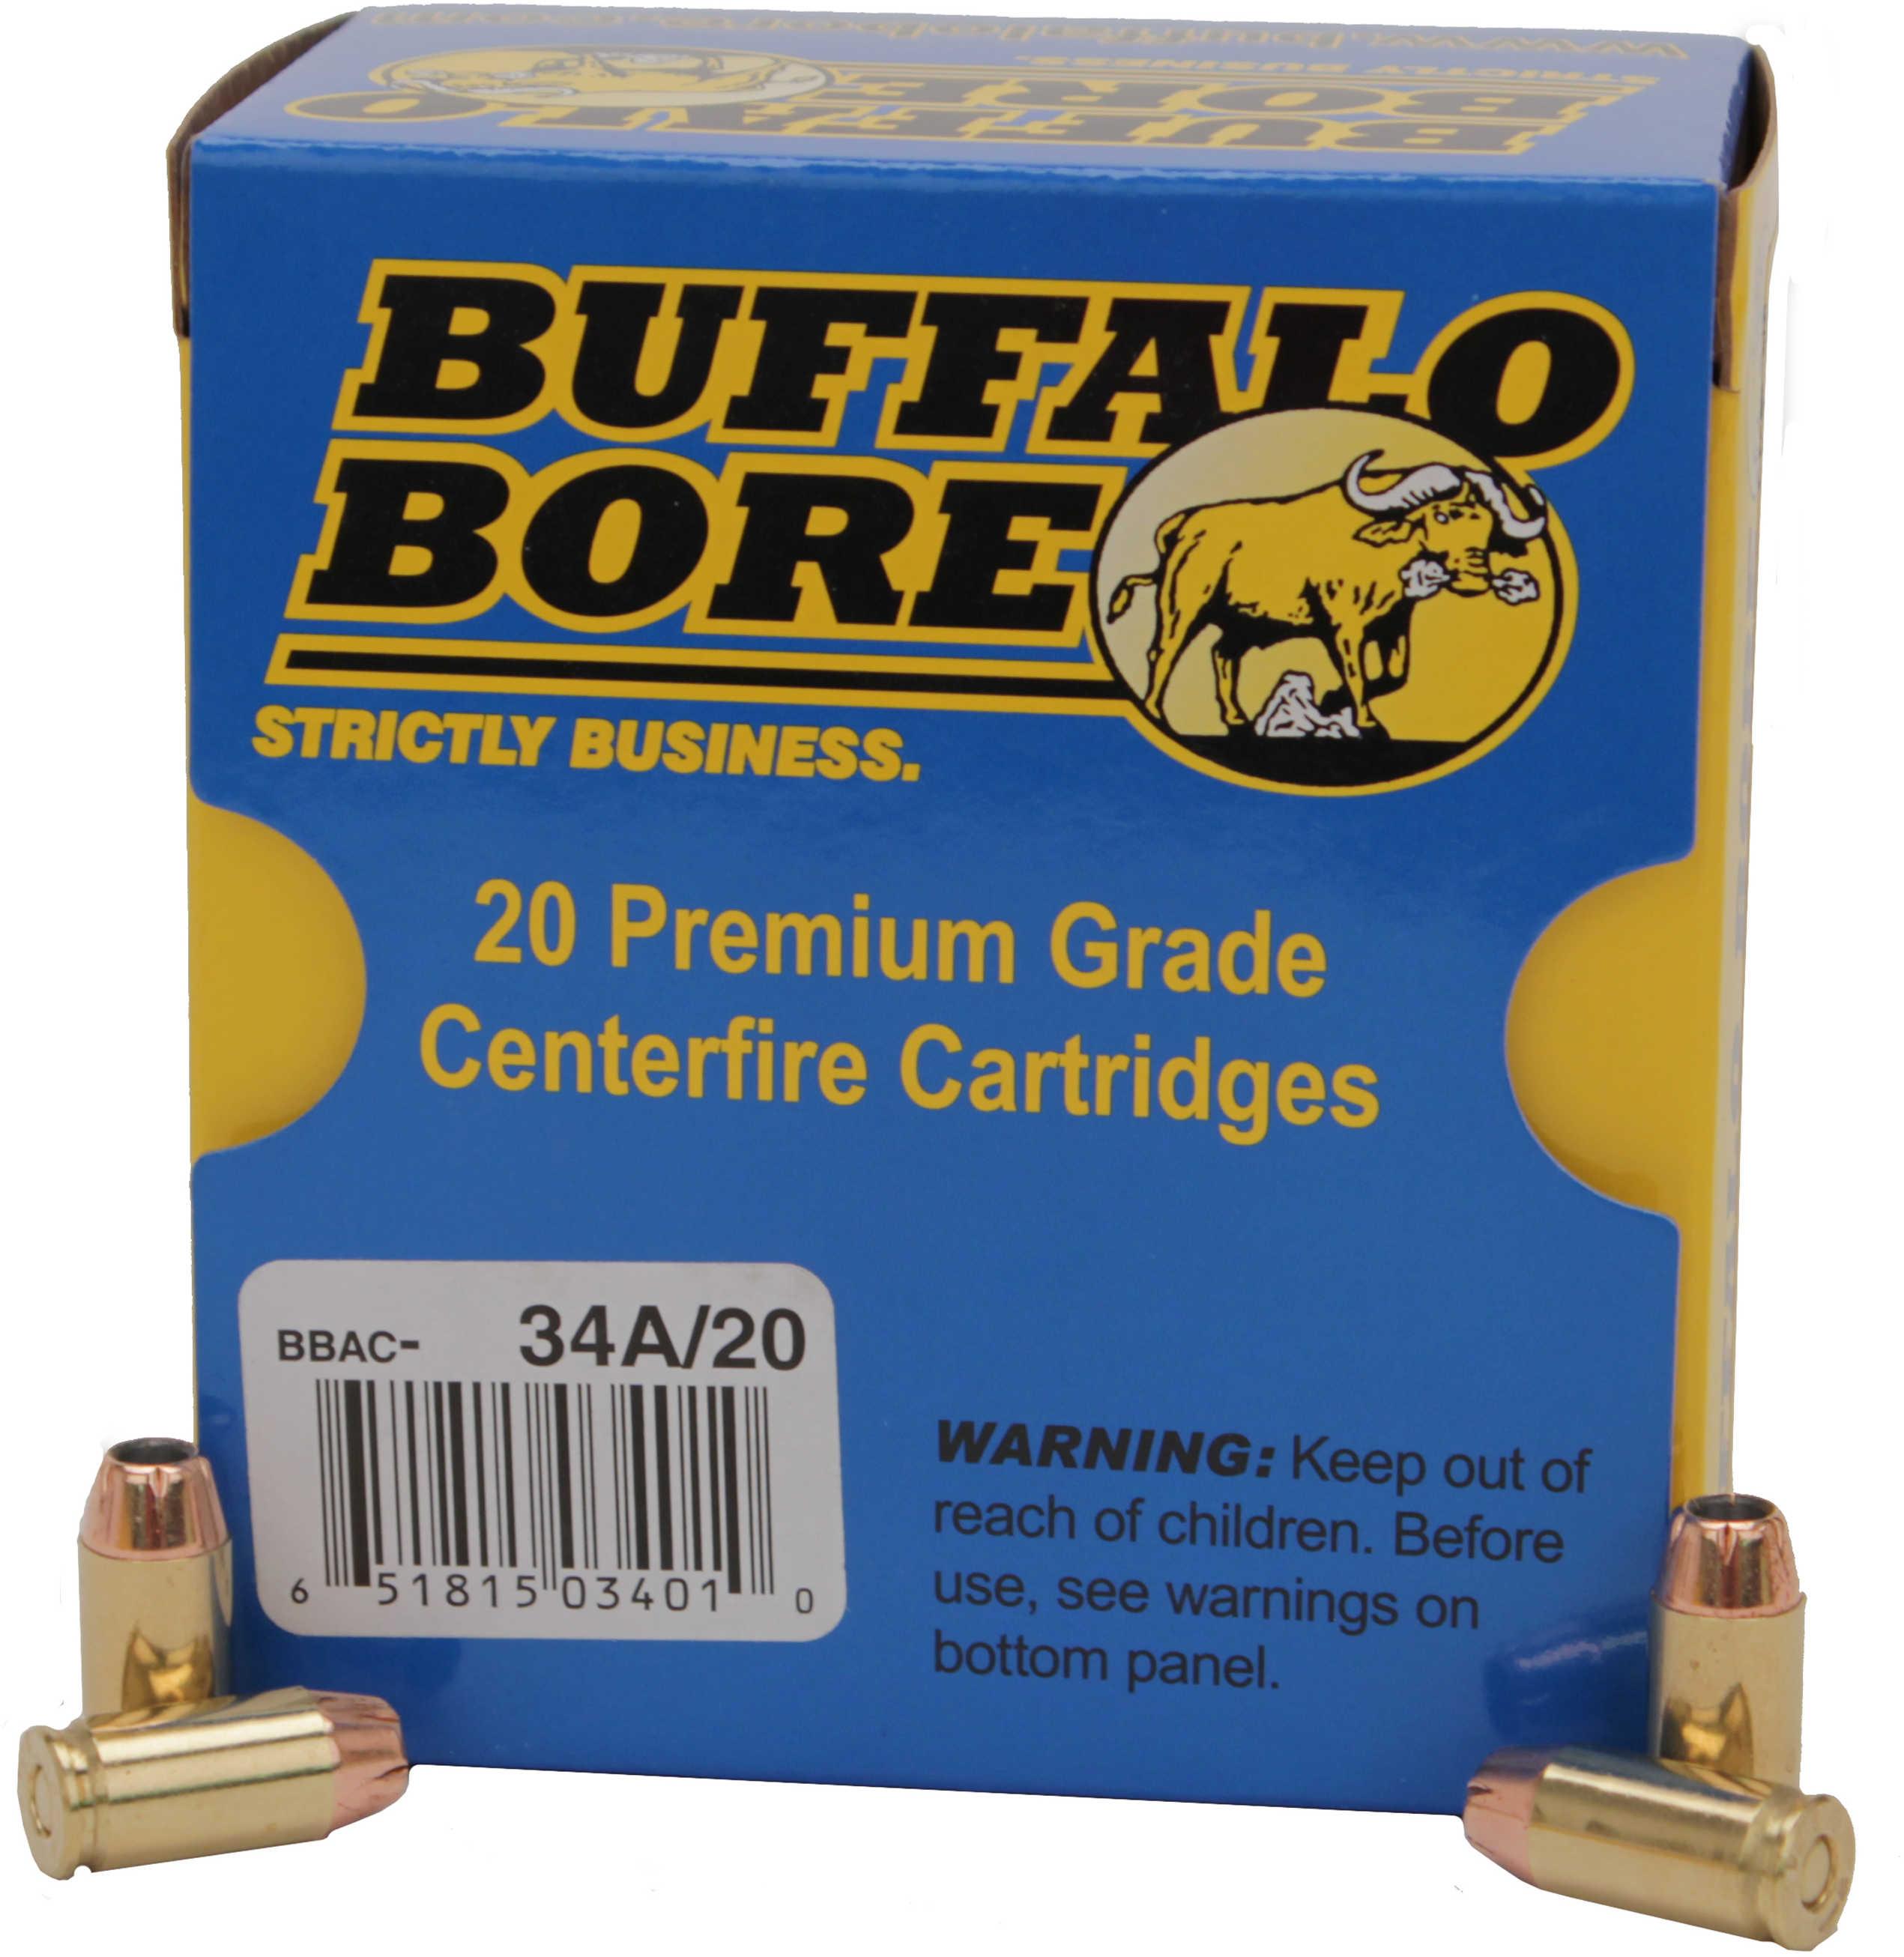 Buffalo Bore Ammunition Handgun 9mm JHP 95 Grains 20 Rounds Per Box 34A/20